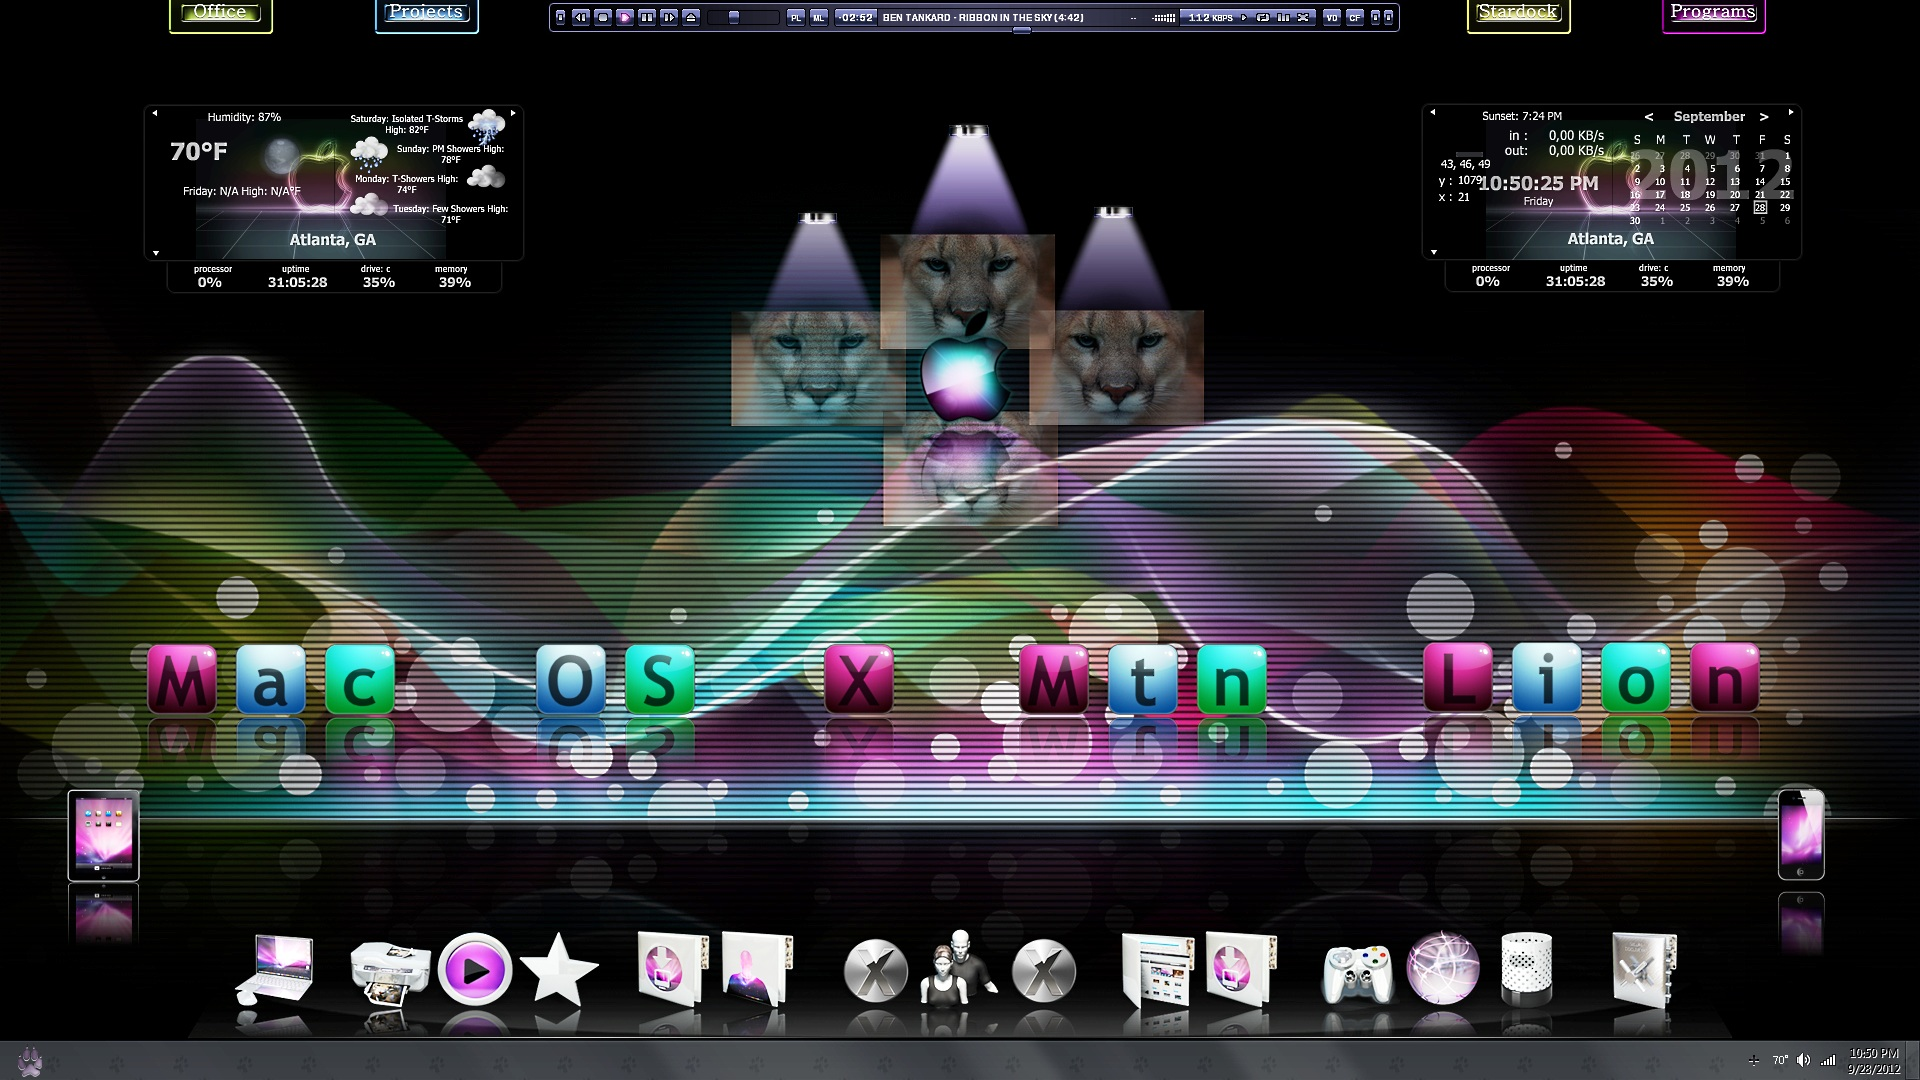 Mac OS X Mtn Lion 4